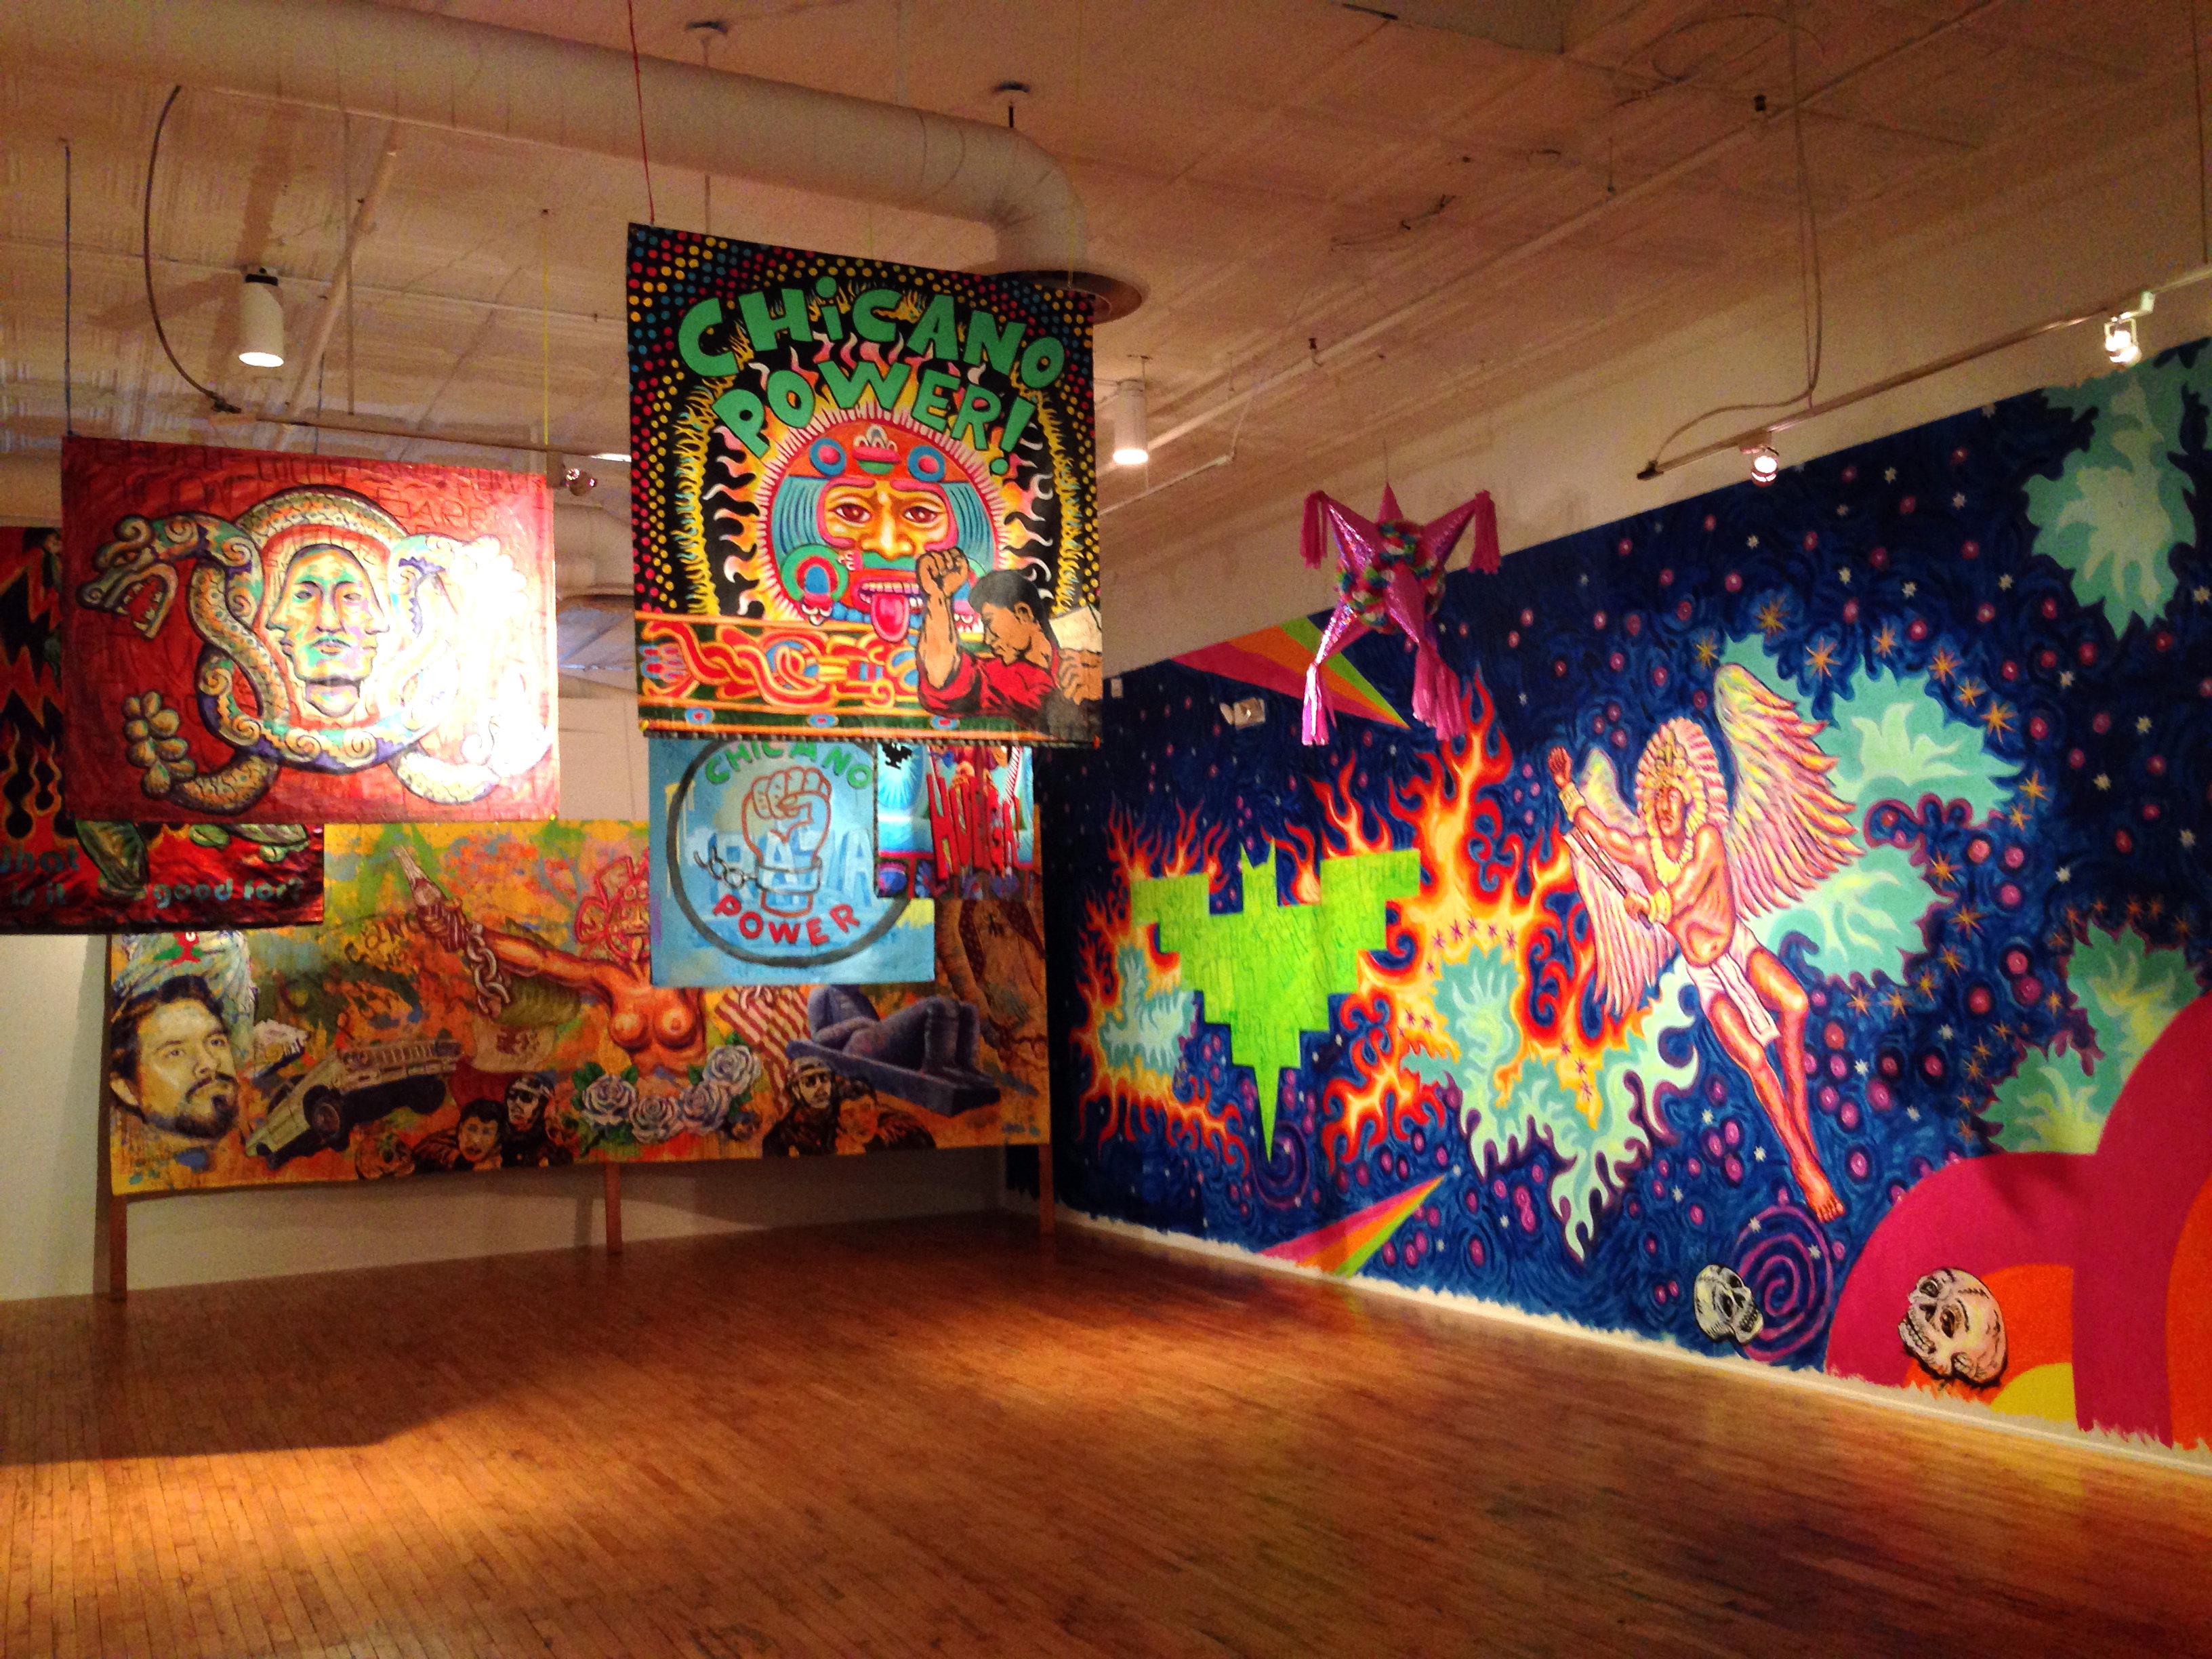 Photo: Murals by Carlos Fresquez and Francisco Zamora at Museo de las Americas